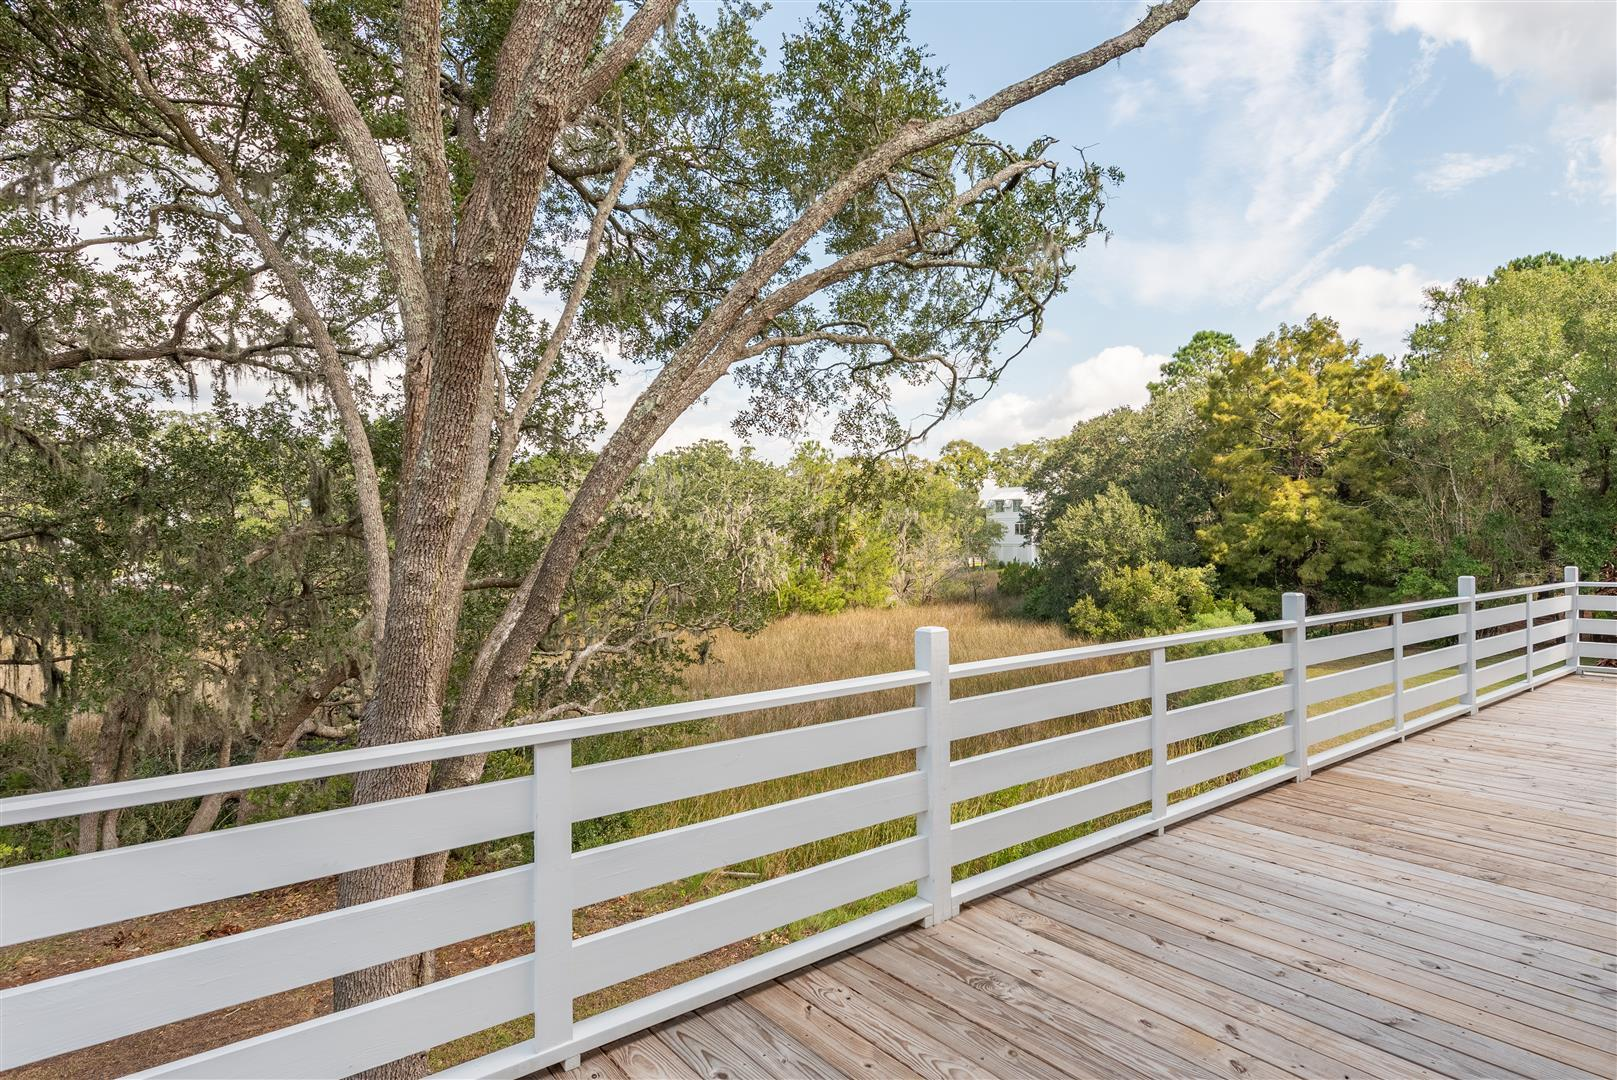 Scanlonville Homes For Sale - 160 5th, Mount Pleasant, SC - 1